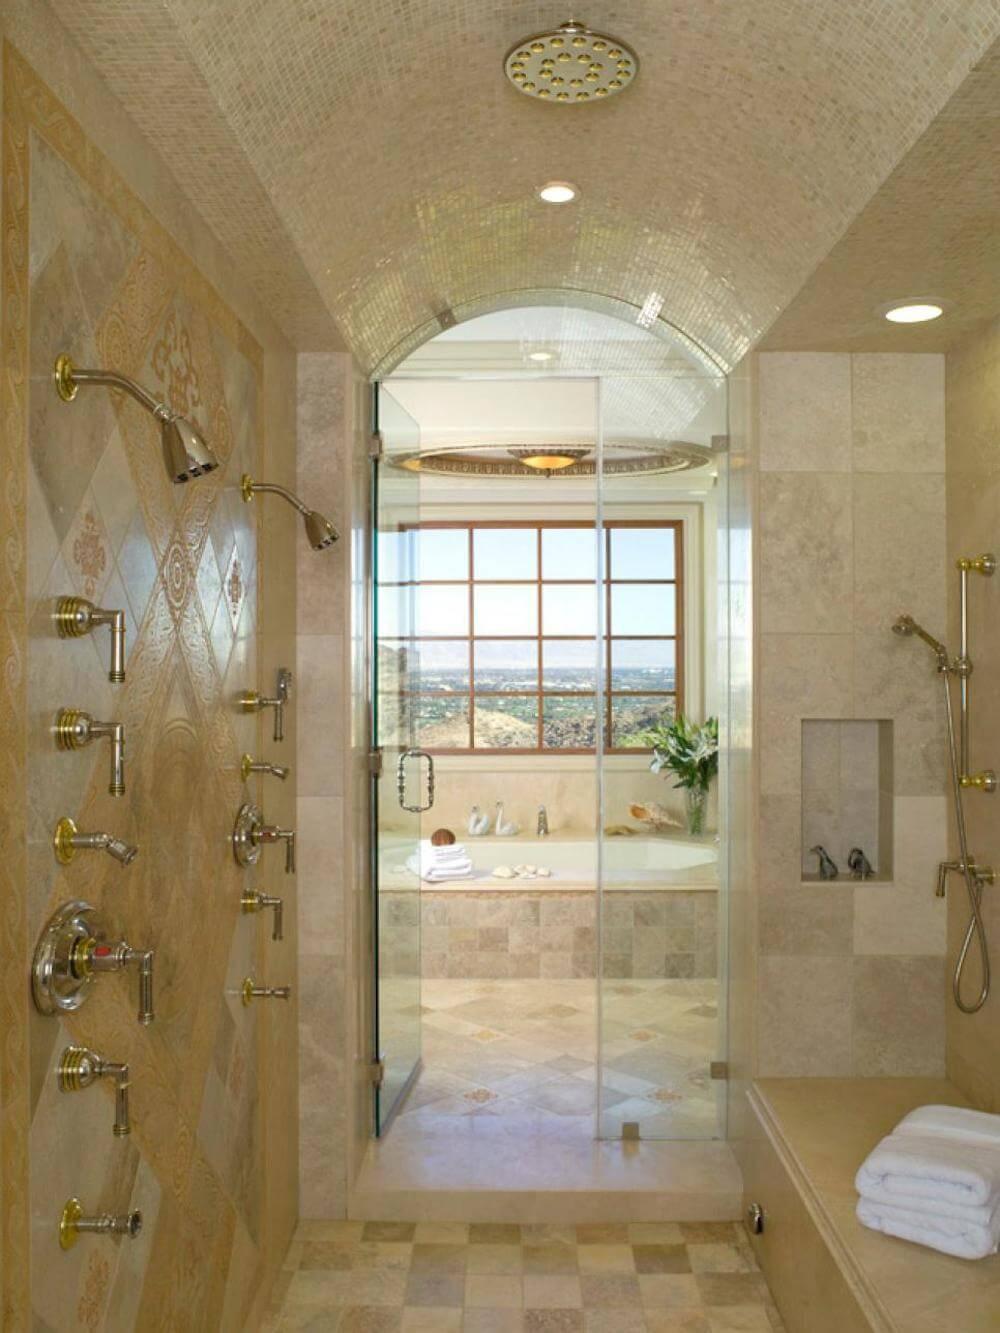 Unclog Shower Drain